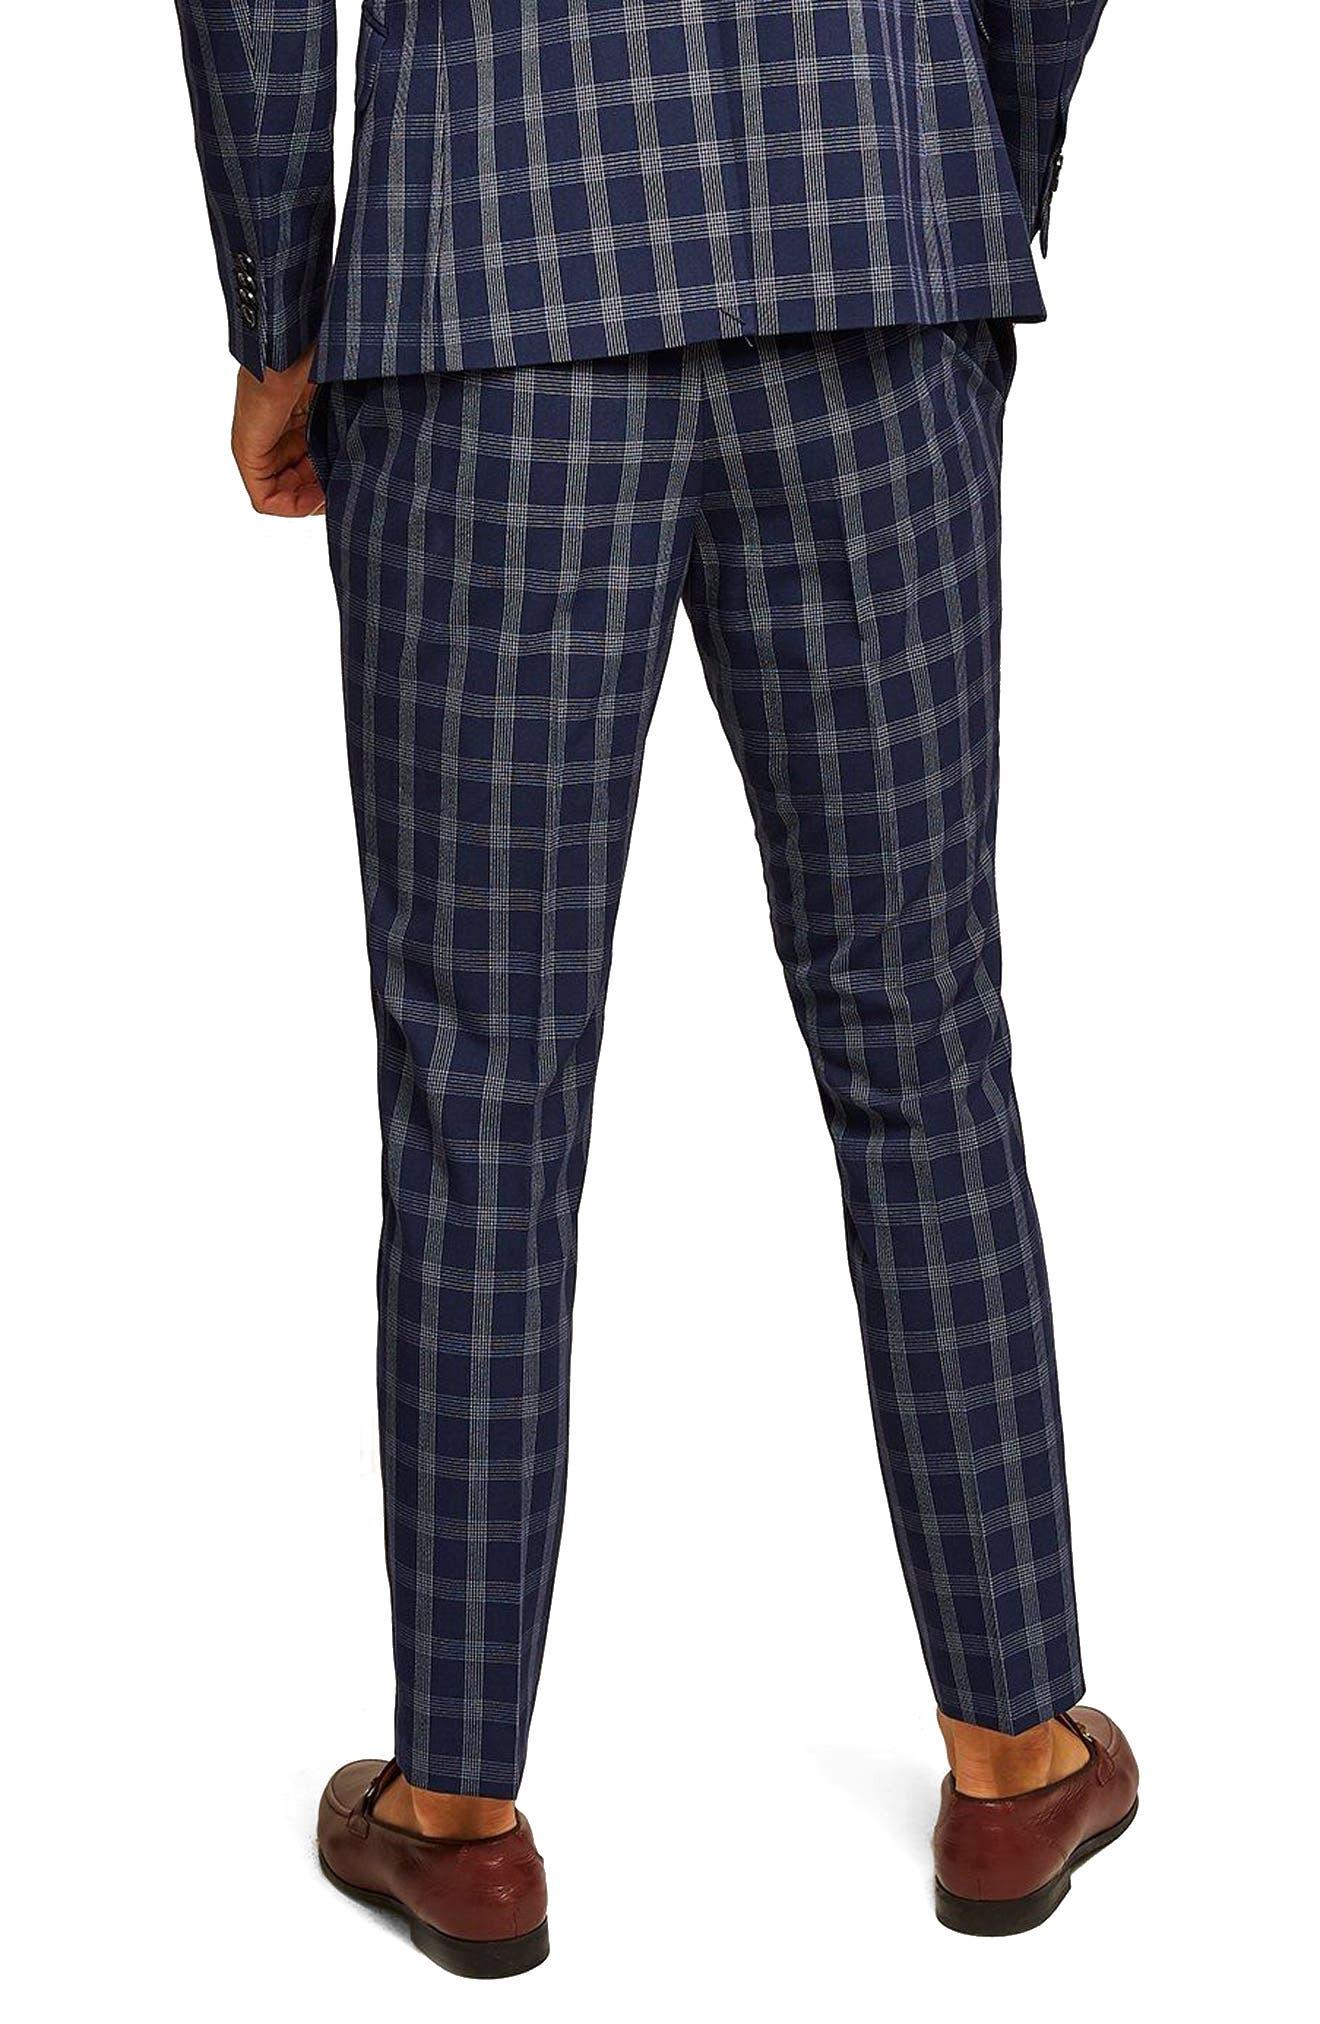 Muscle Fit Check Suit Trousers,                             Alternate thumbnail 2, color,                             NAVY BLUE MULTI